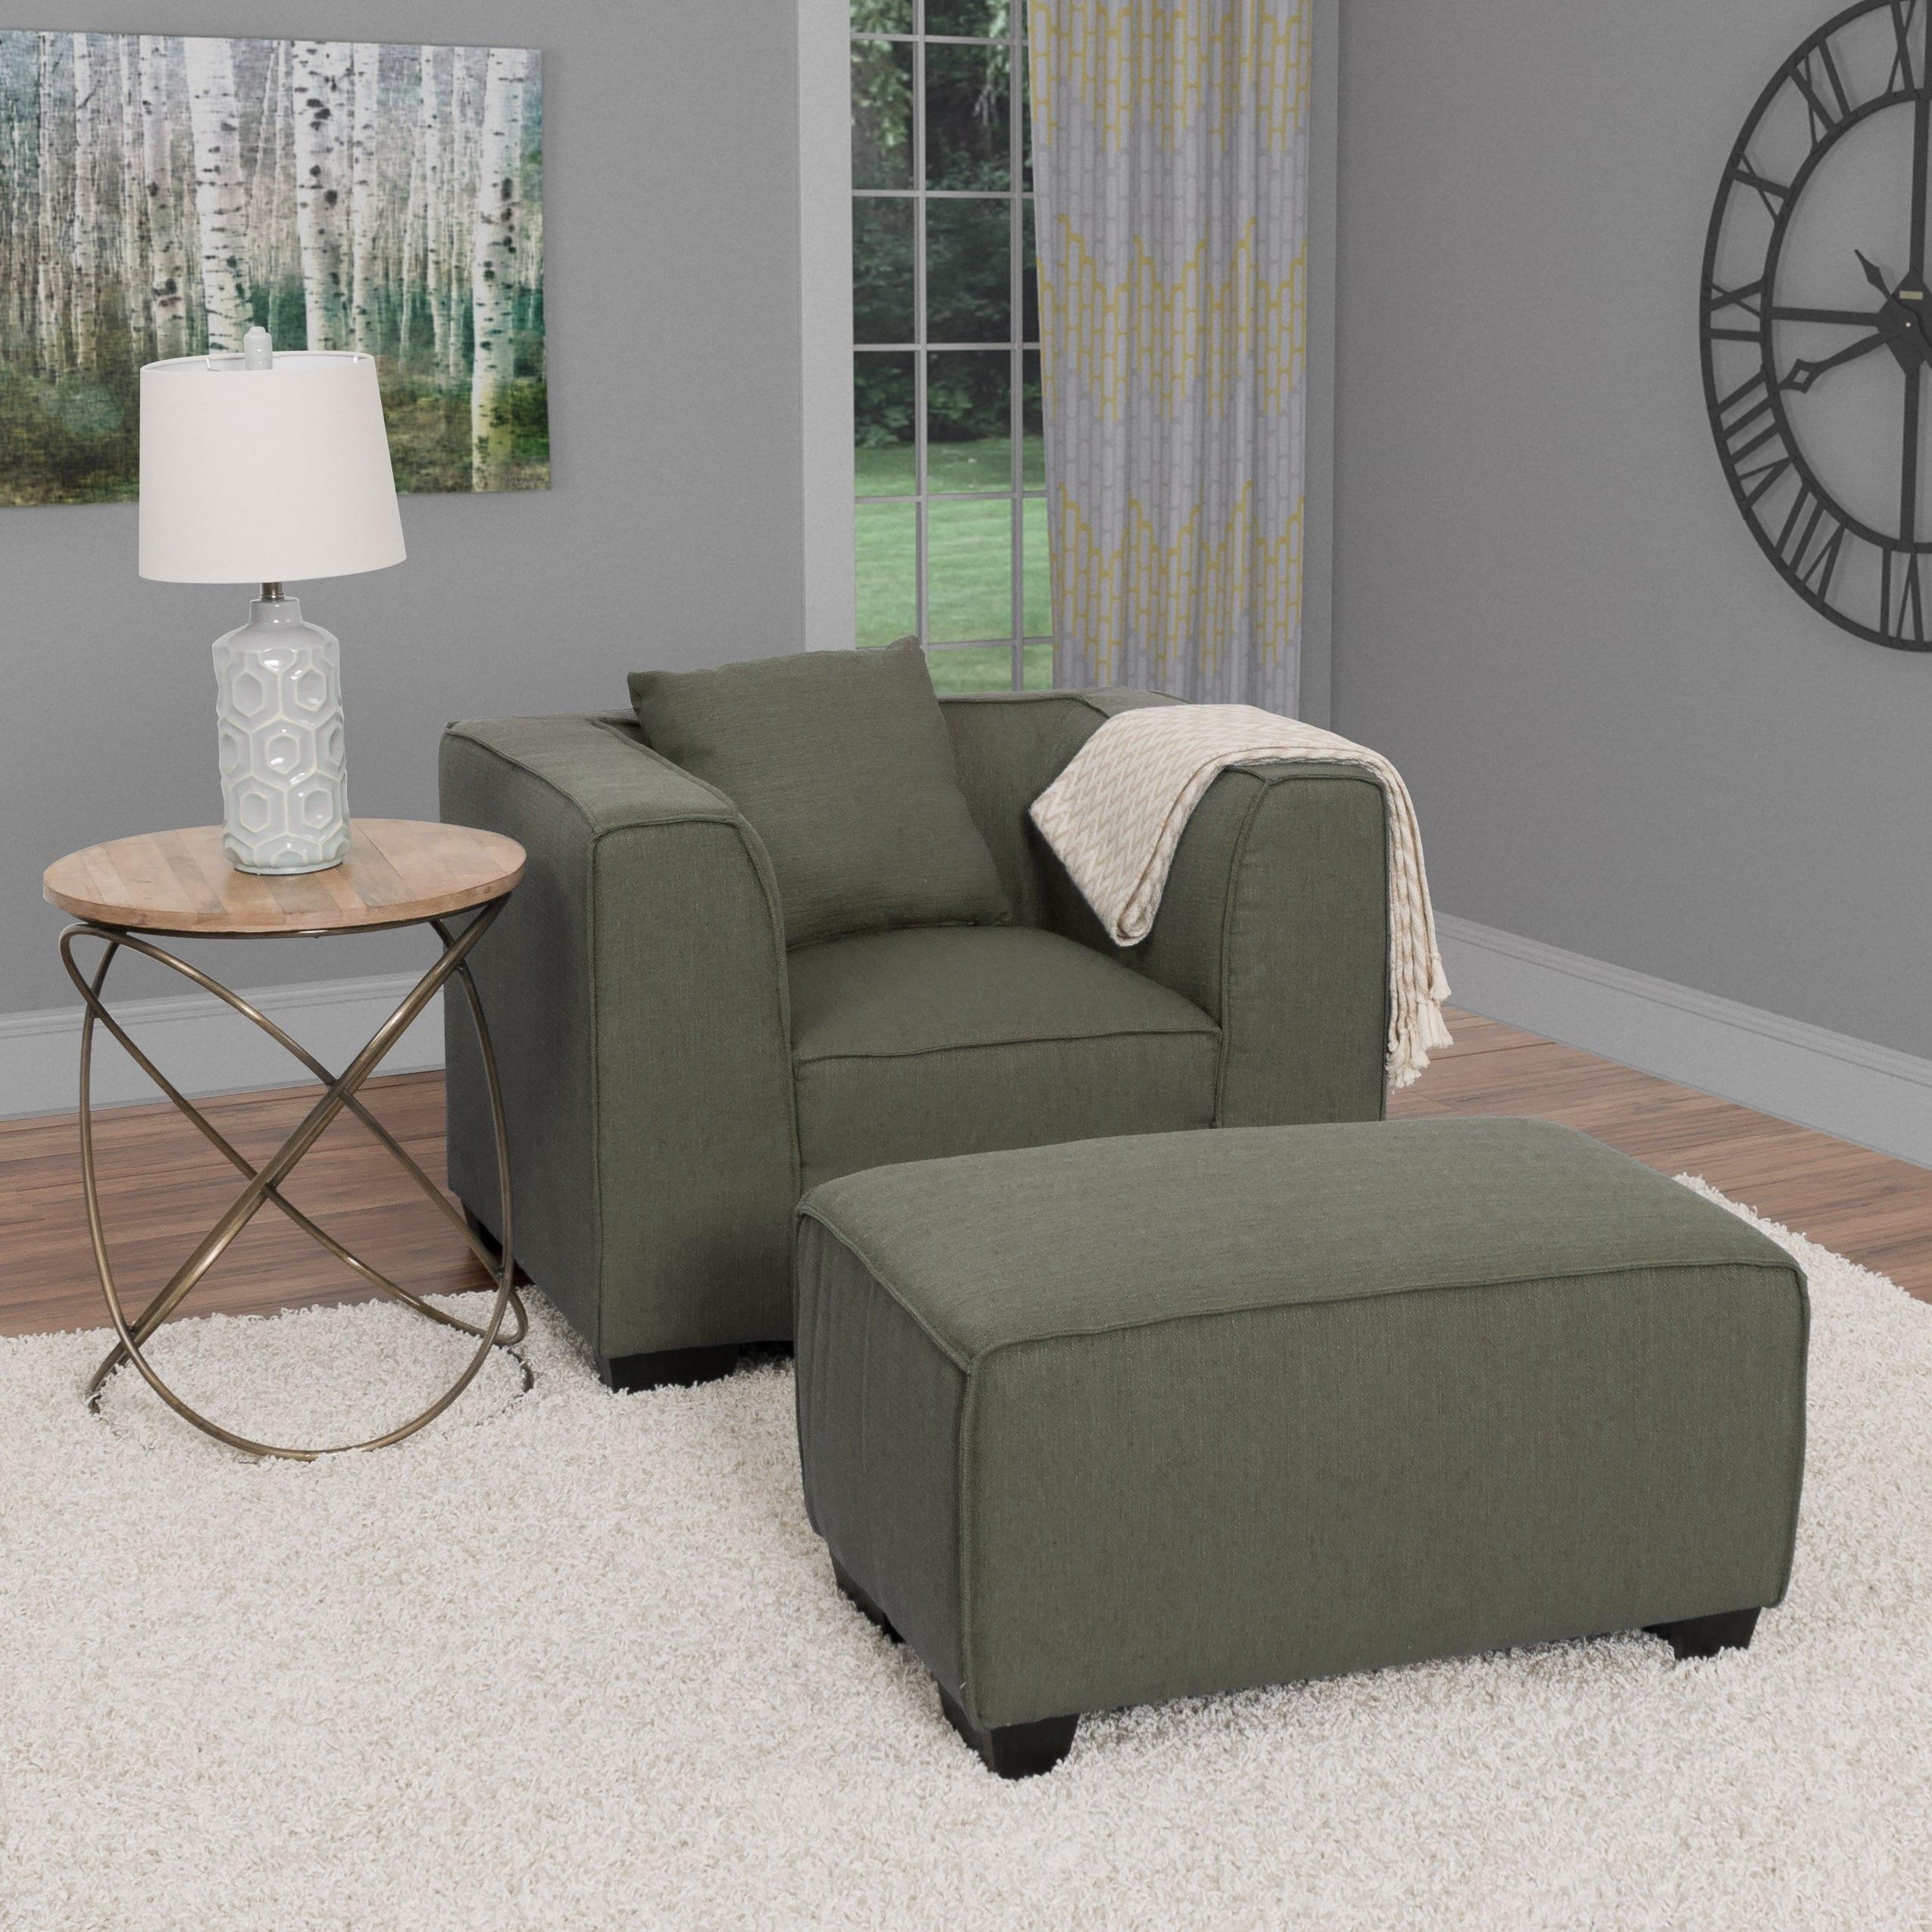 CorLiving Lida 2pc Fabric Chair and Ottoman Set (Green)